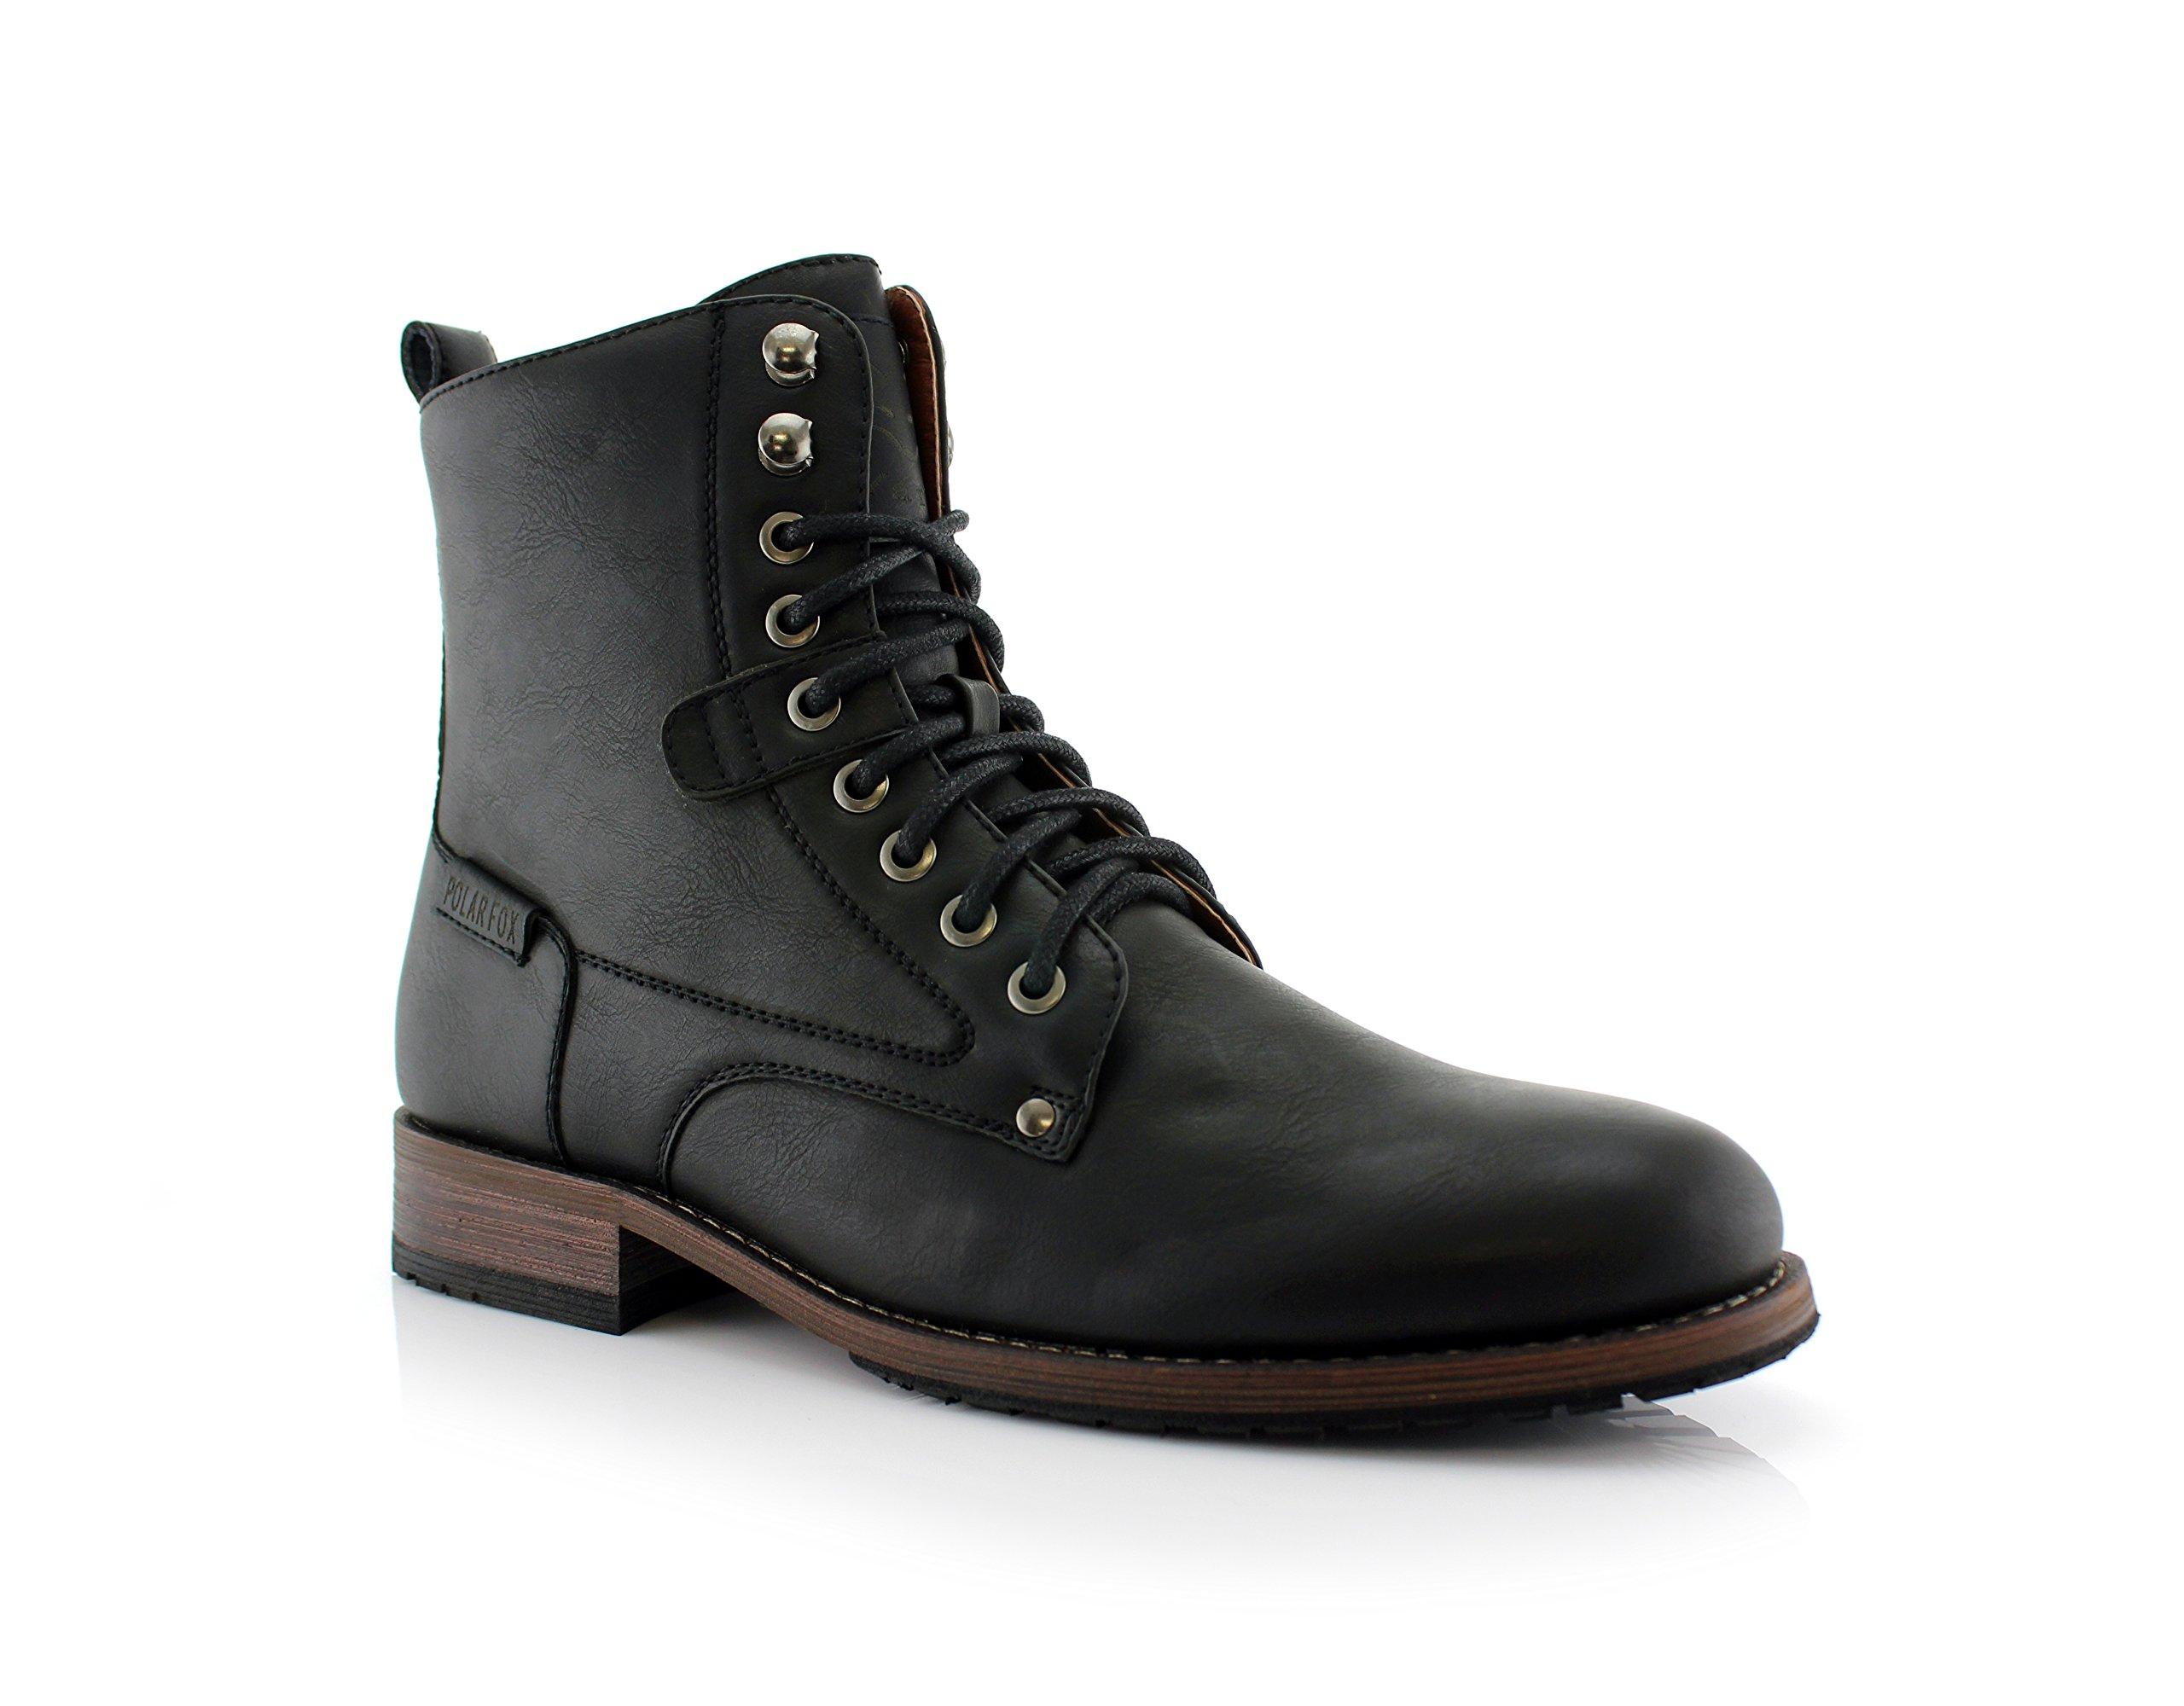 Polar Fox Curry MPX808580 Stylish Boots (8, Black)